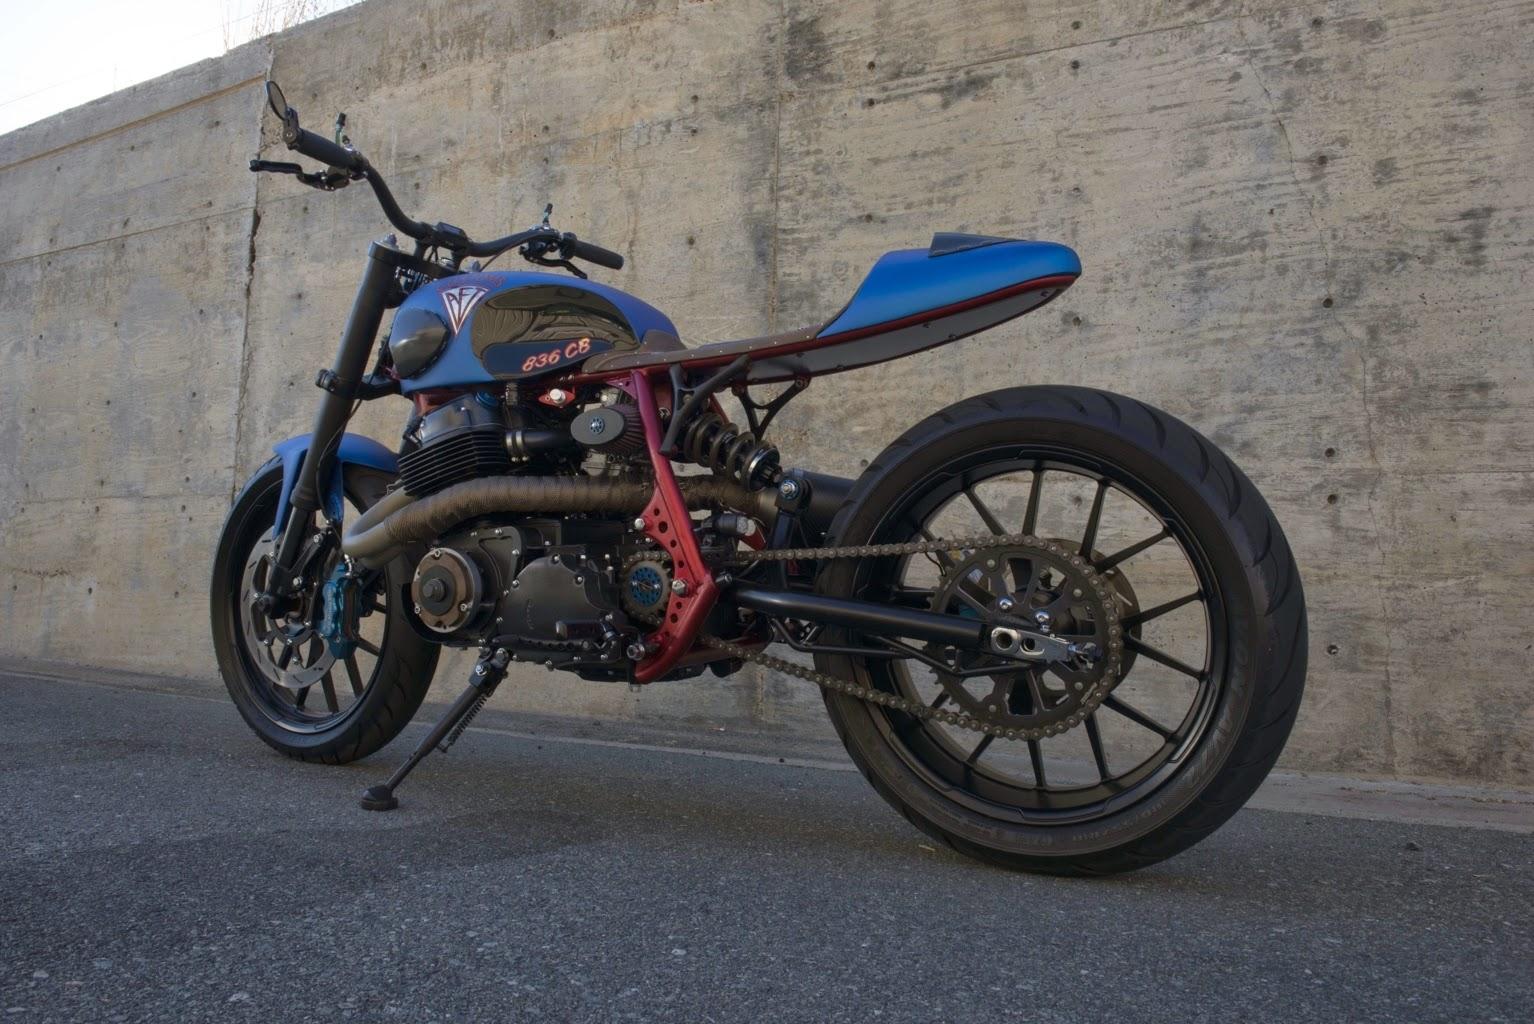 AFT Customs CB836 Honda Streetfighter   Motorcycle